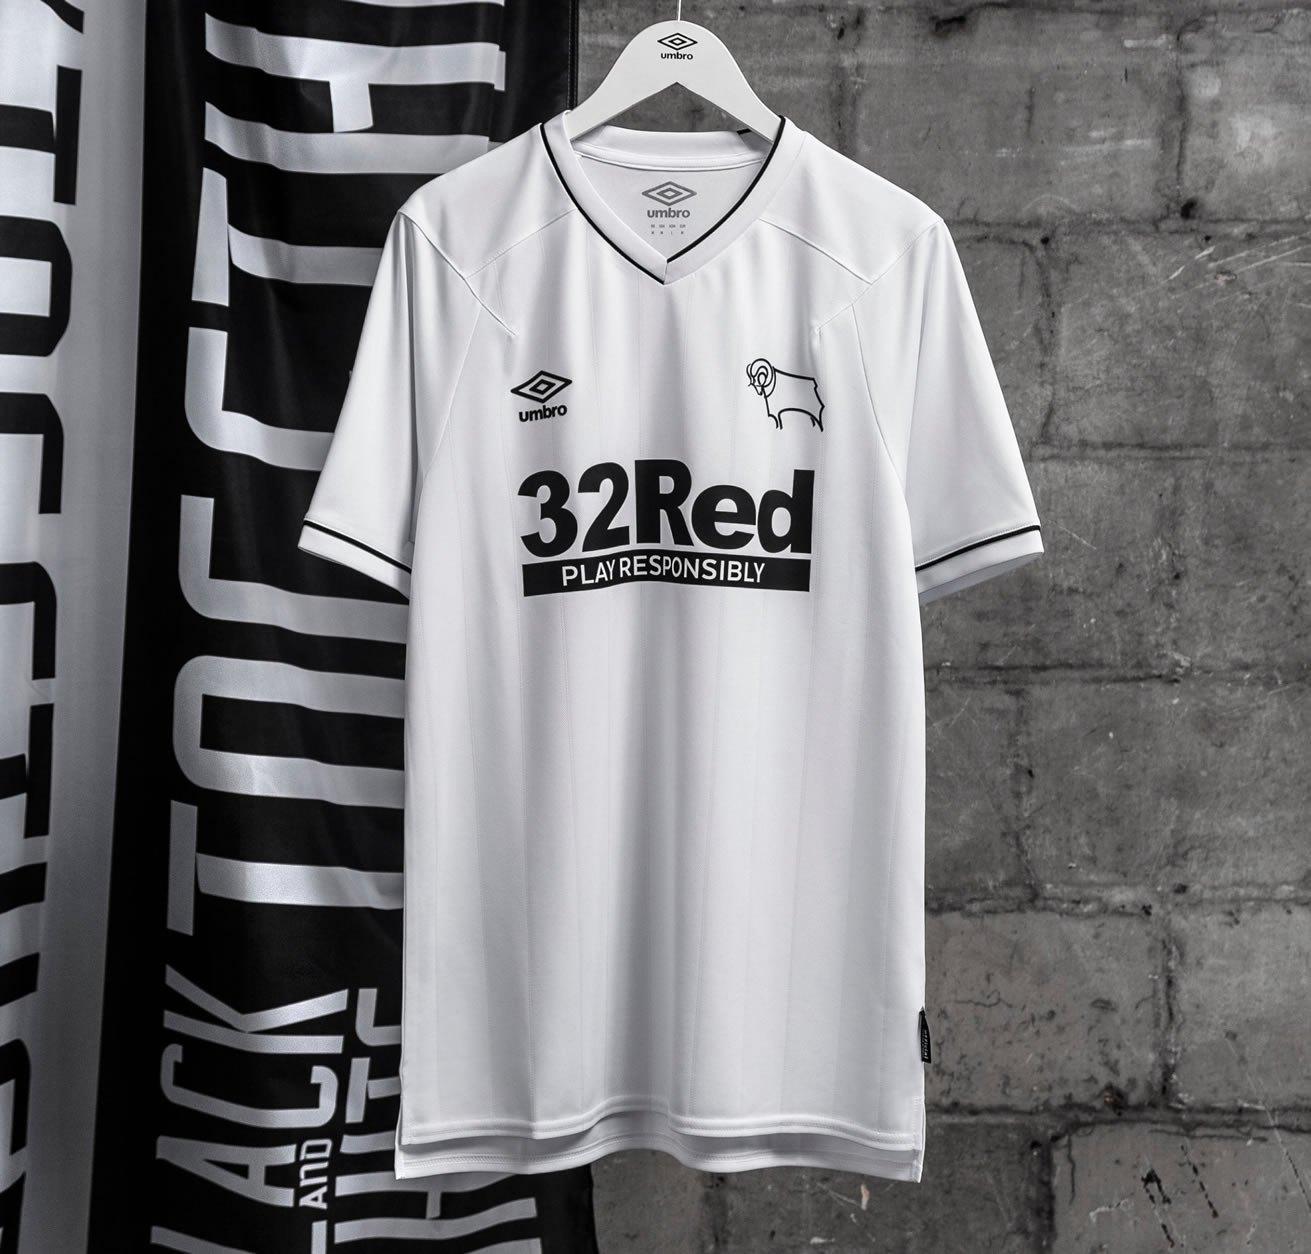 Camisetas Umbro del Derby County 2020/21 | Imagen Twitter Oficial